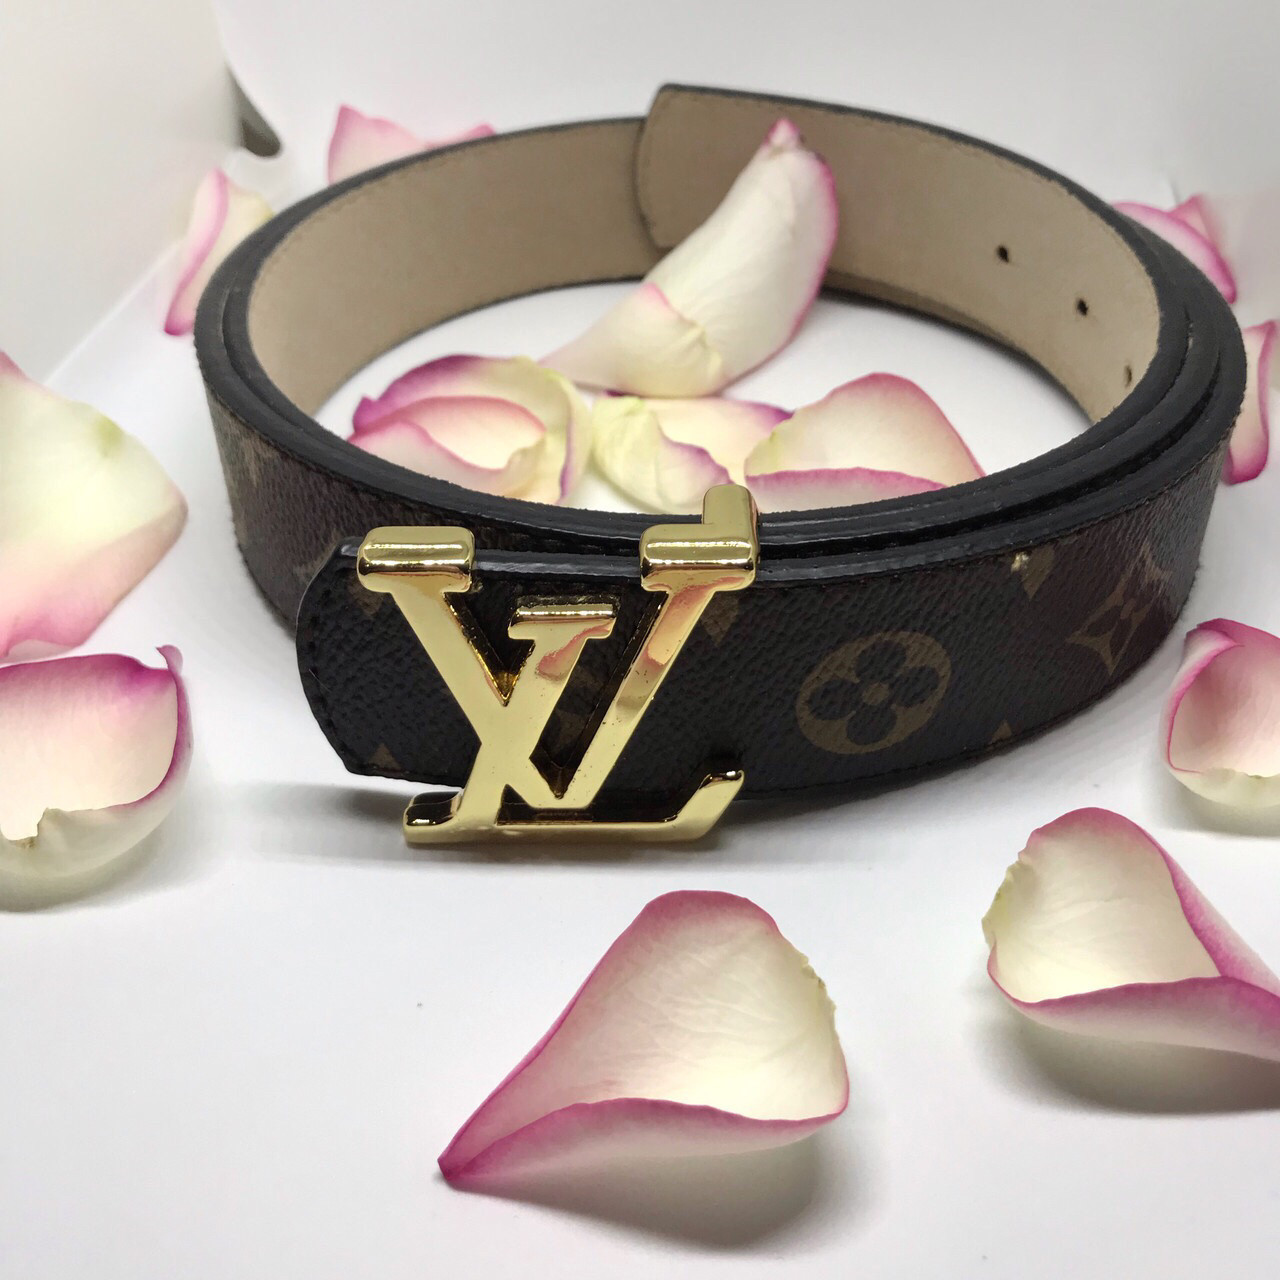 Ремень  в стиле  Louis Vuitton Initiales ( Луи Витон)